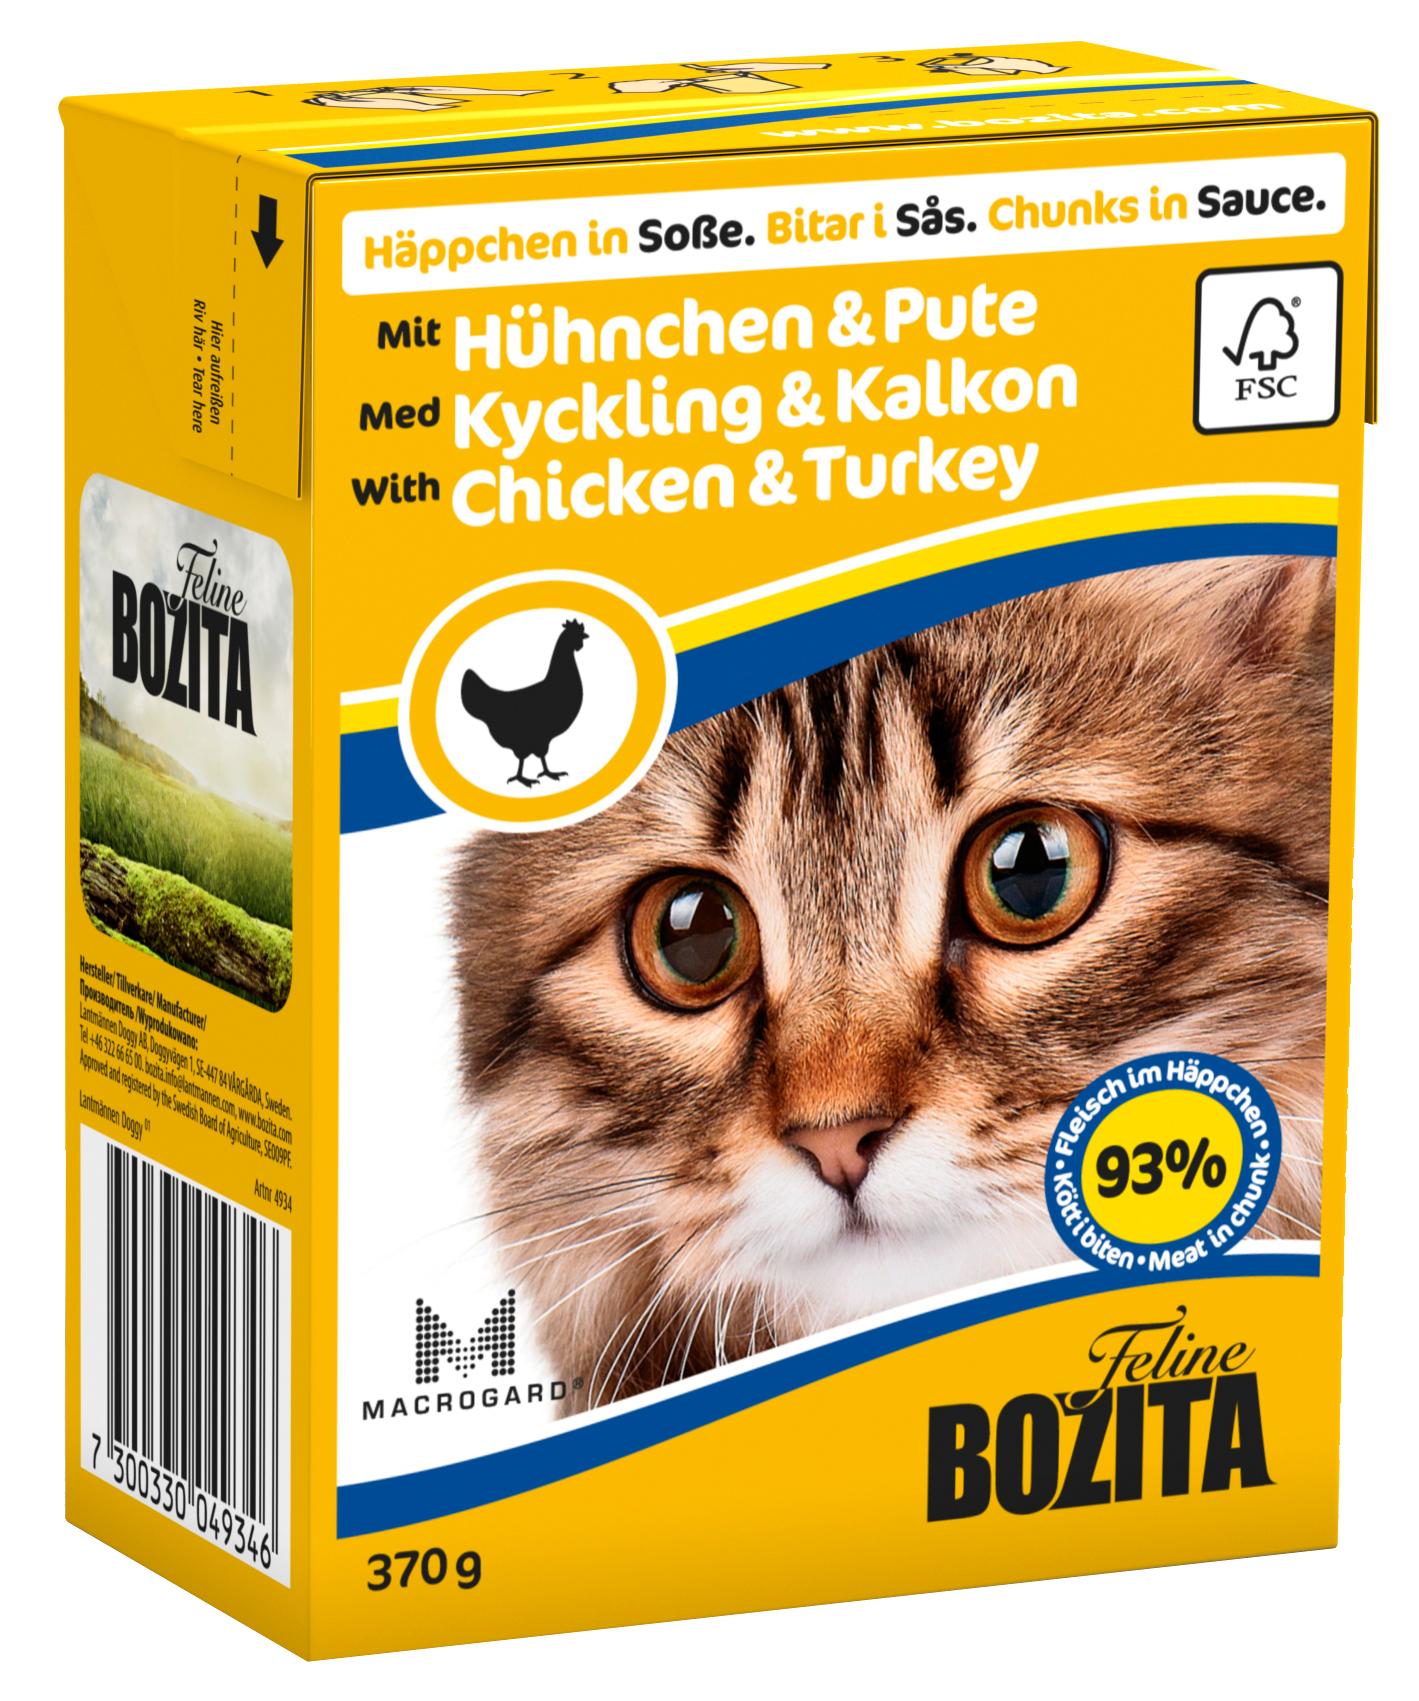 Bozita Bitar i Sås m Kyckling Kalkon 370g